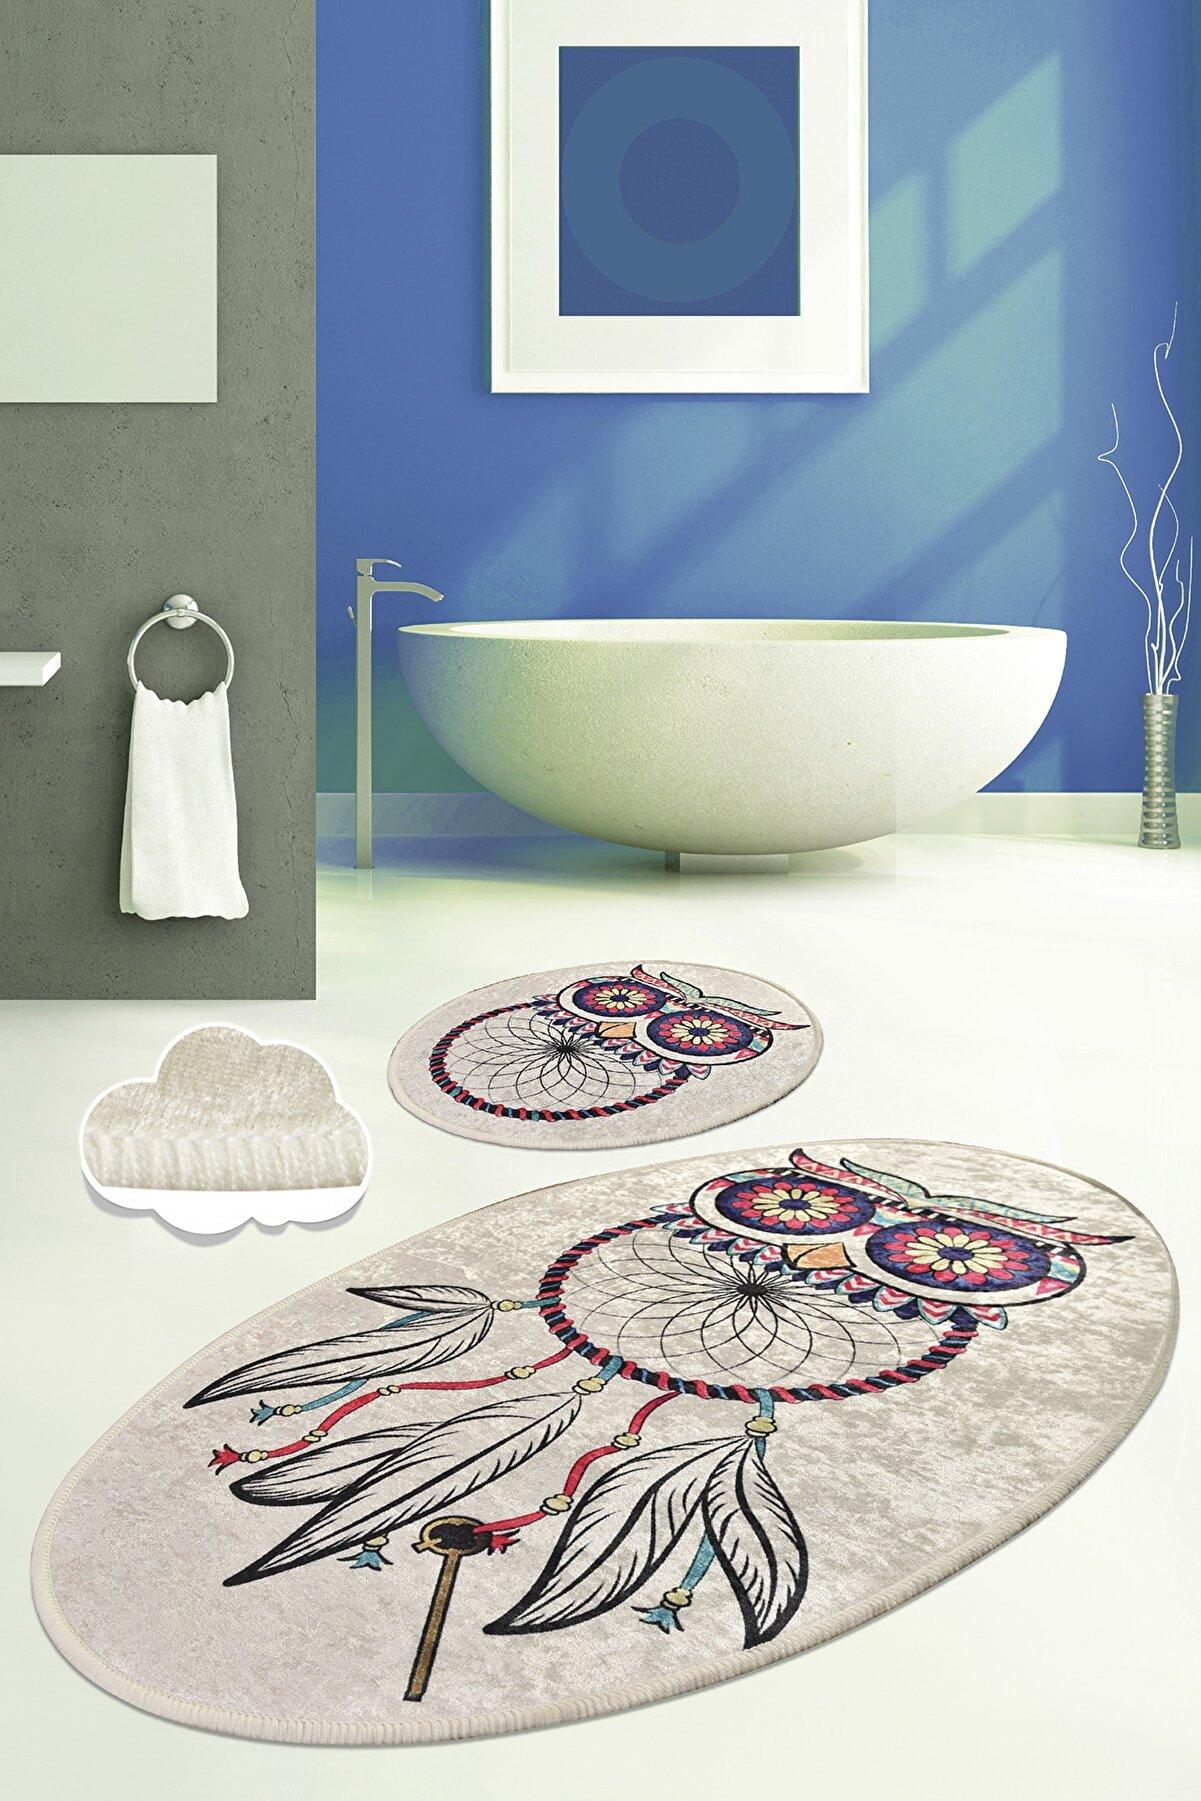 Chilai Home DREAM DJT 2 LI SET Banyo Halısı